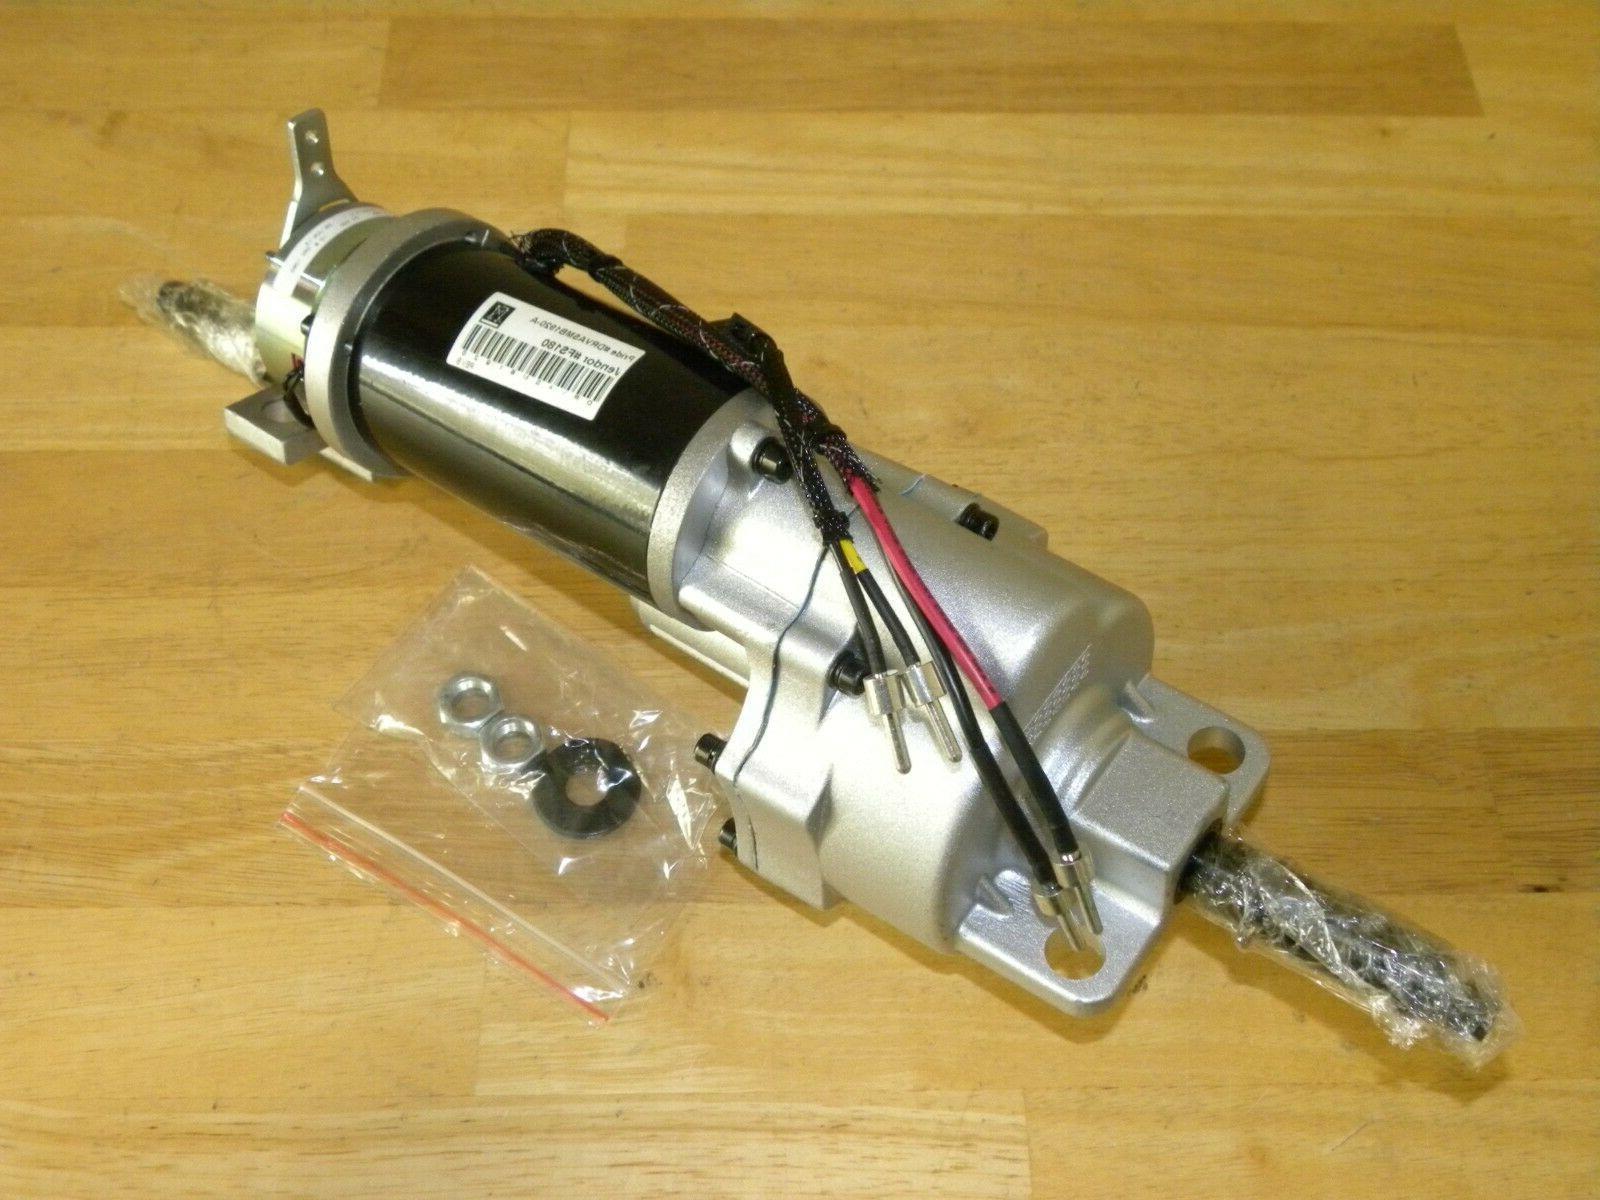 drvasmb1920 a motor brake transaxle assembly gogo